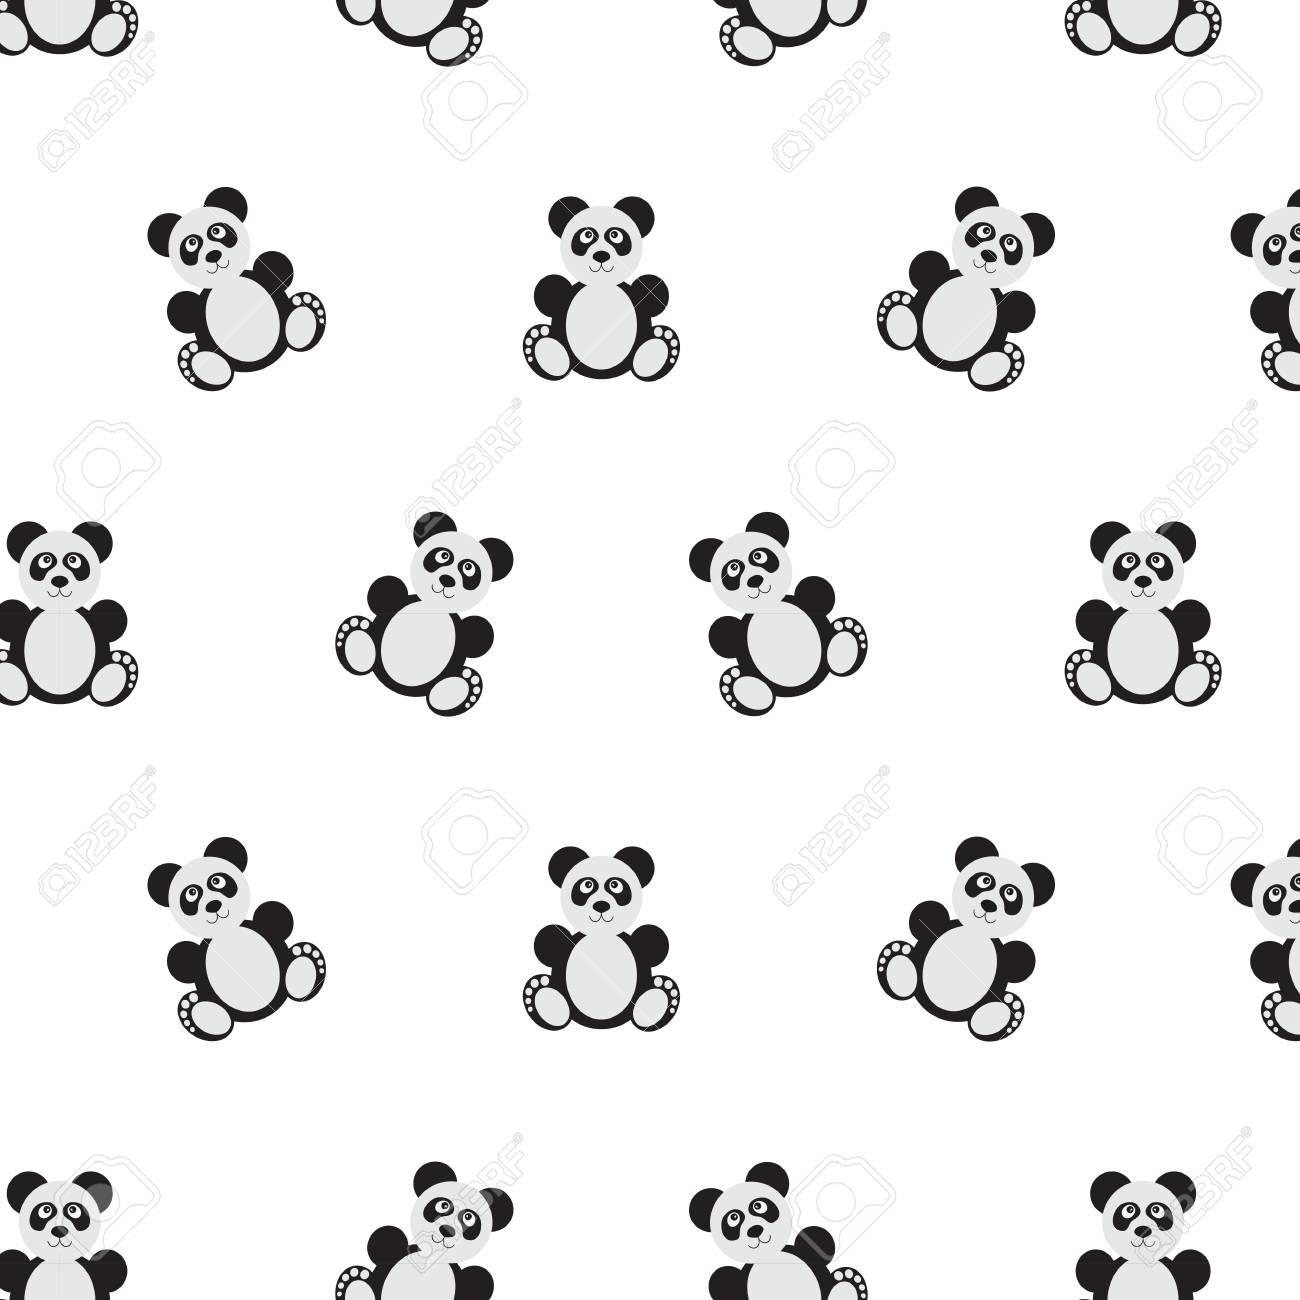 Patrón De Oso Panda. Perfecta Ilustración Vectorial. Estilo De ...